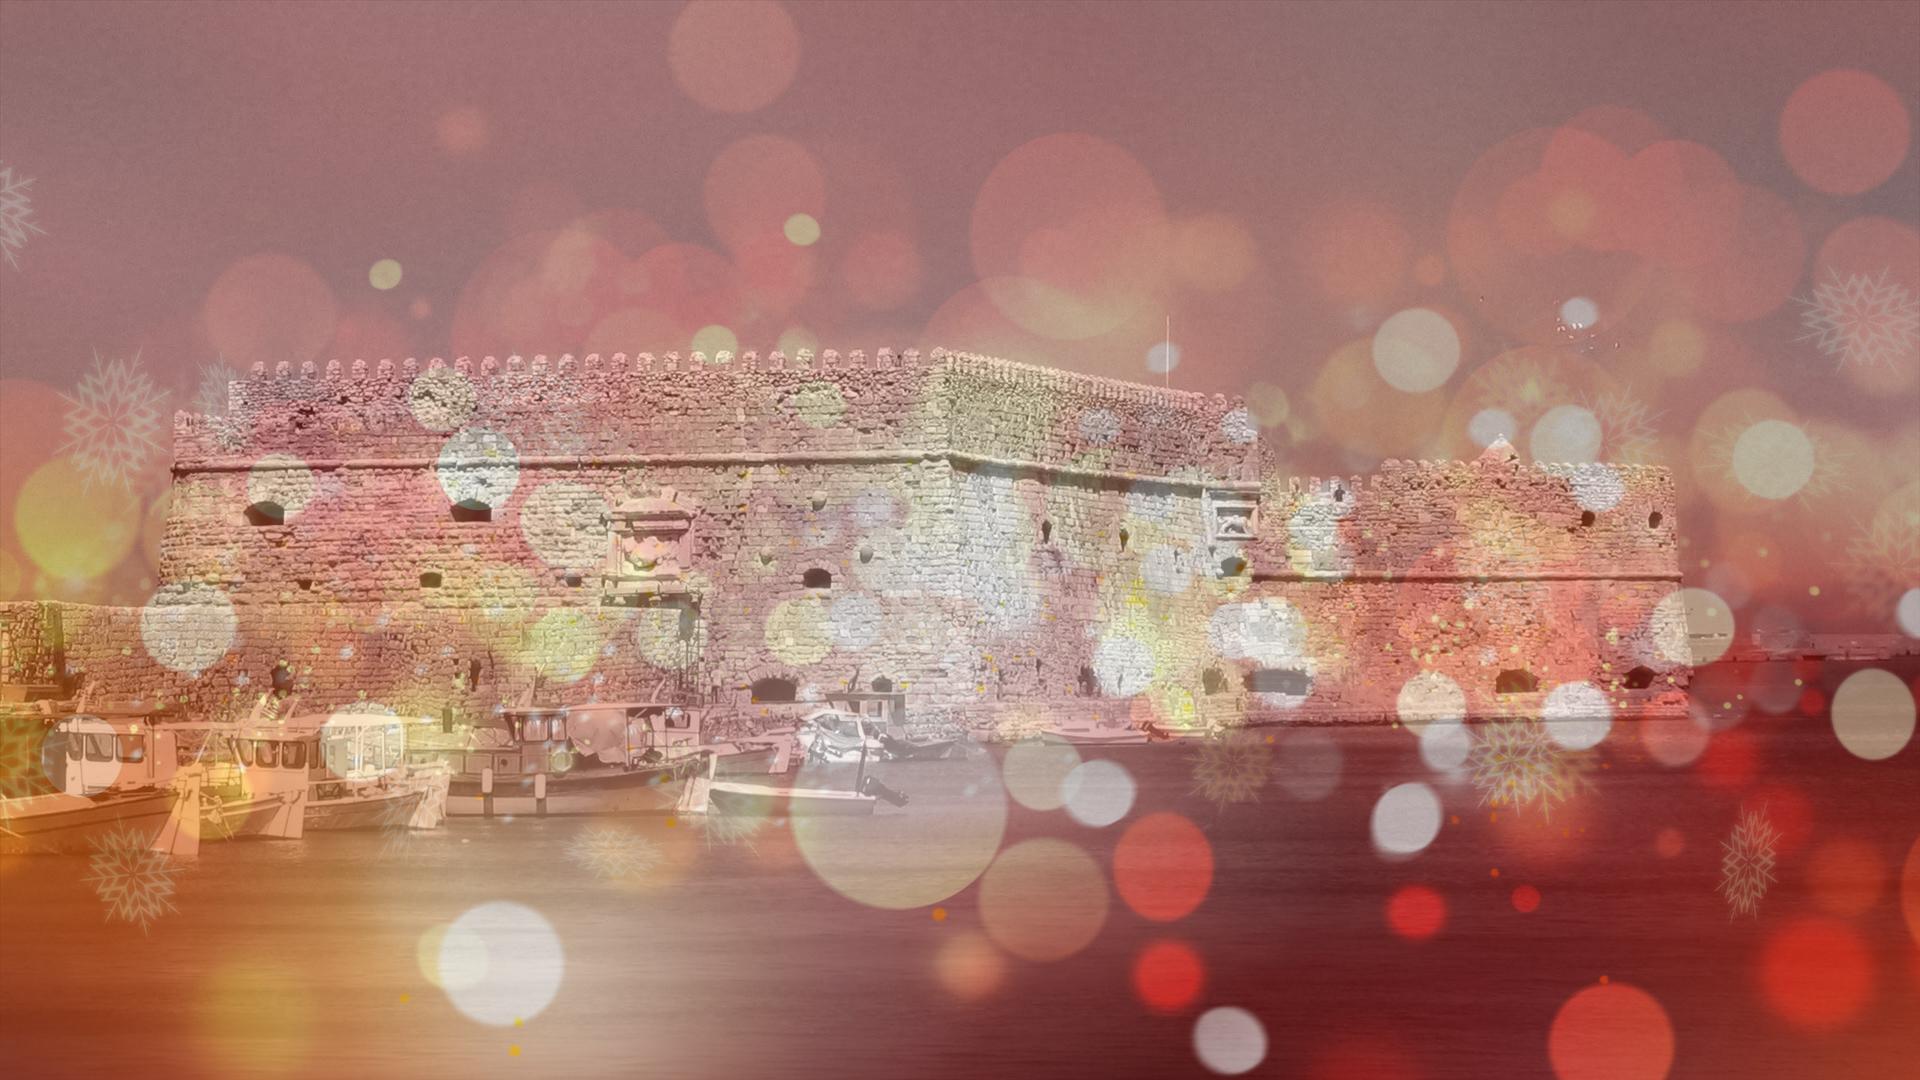 pre Christmas offer: Θεσσαλονίκη- Ηράκλειο με επιστροφή από 87.89€!